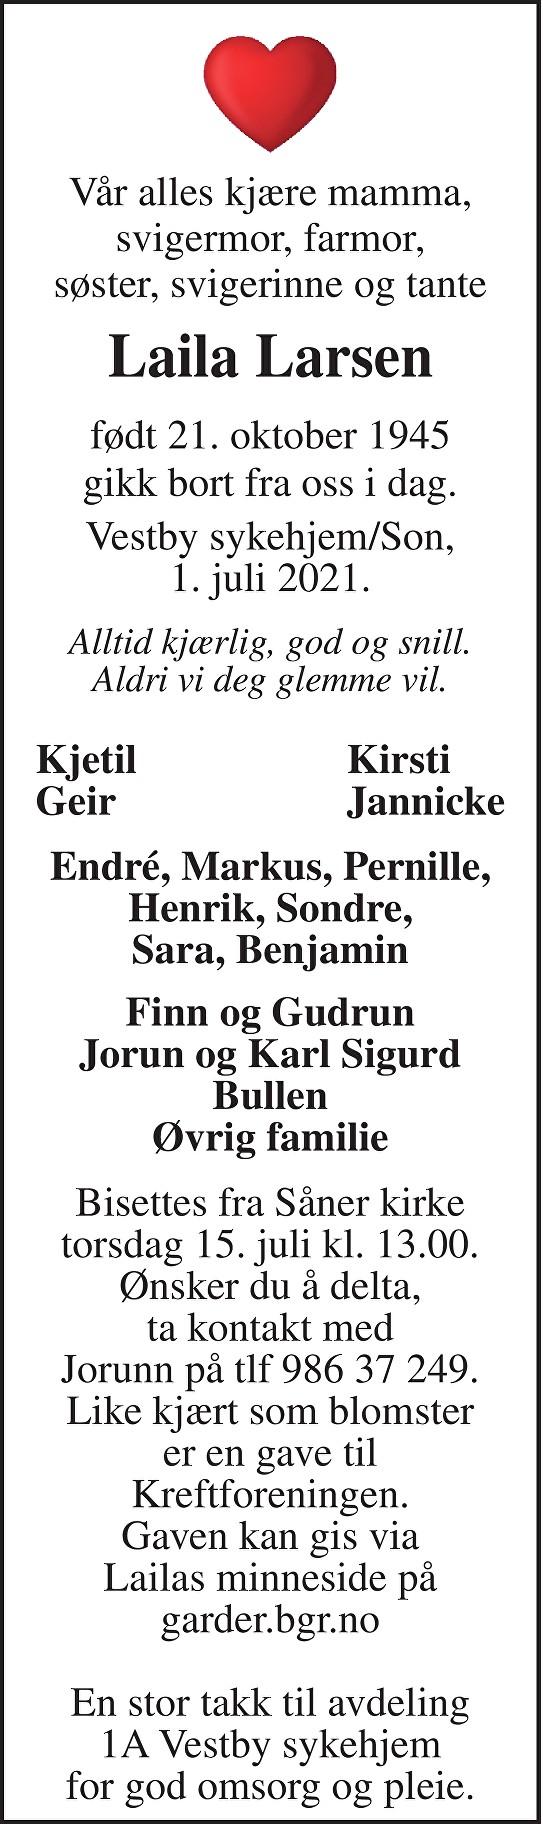 Laila Larsen Dødsannonse